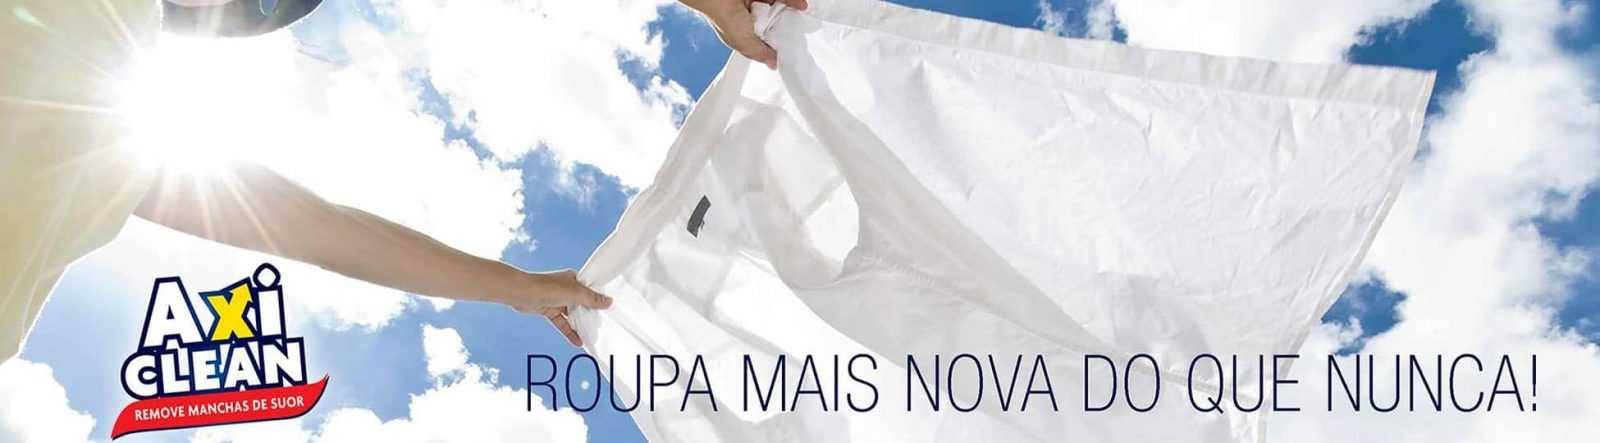 roupa branca sem manchas de suor